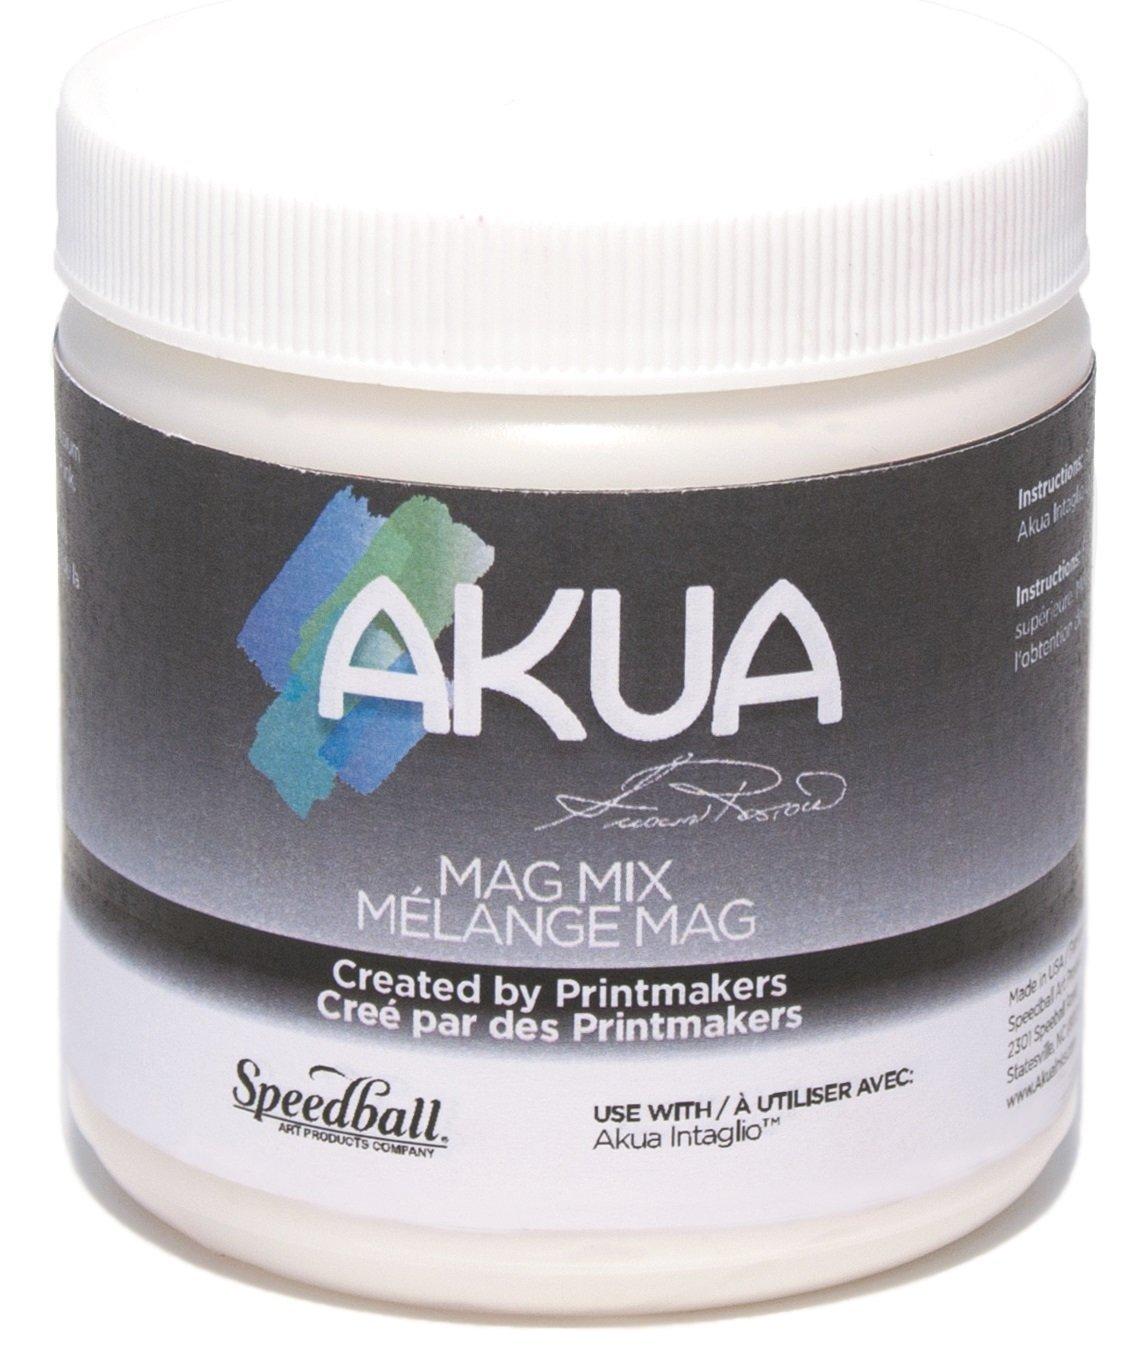 Akua Mag Mix for Intaglio Inks, 8 oz. Bottle (IIAO) by Akua